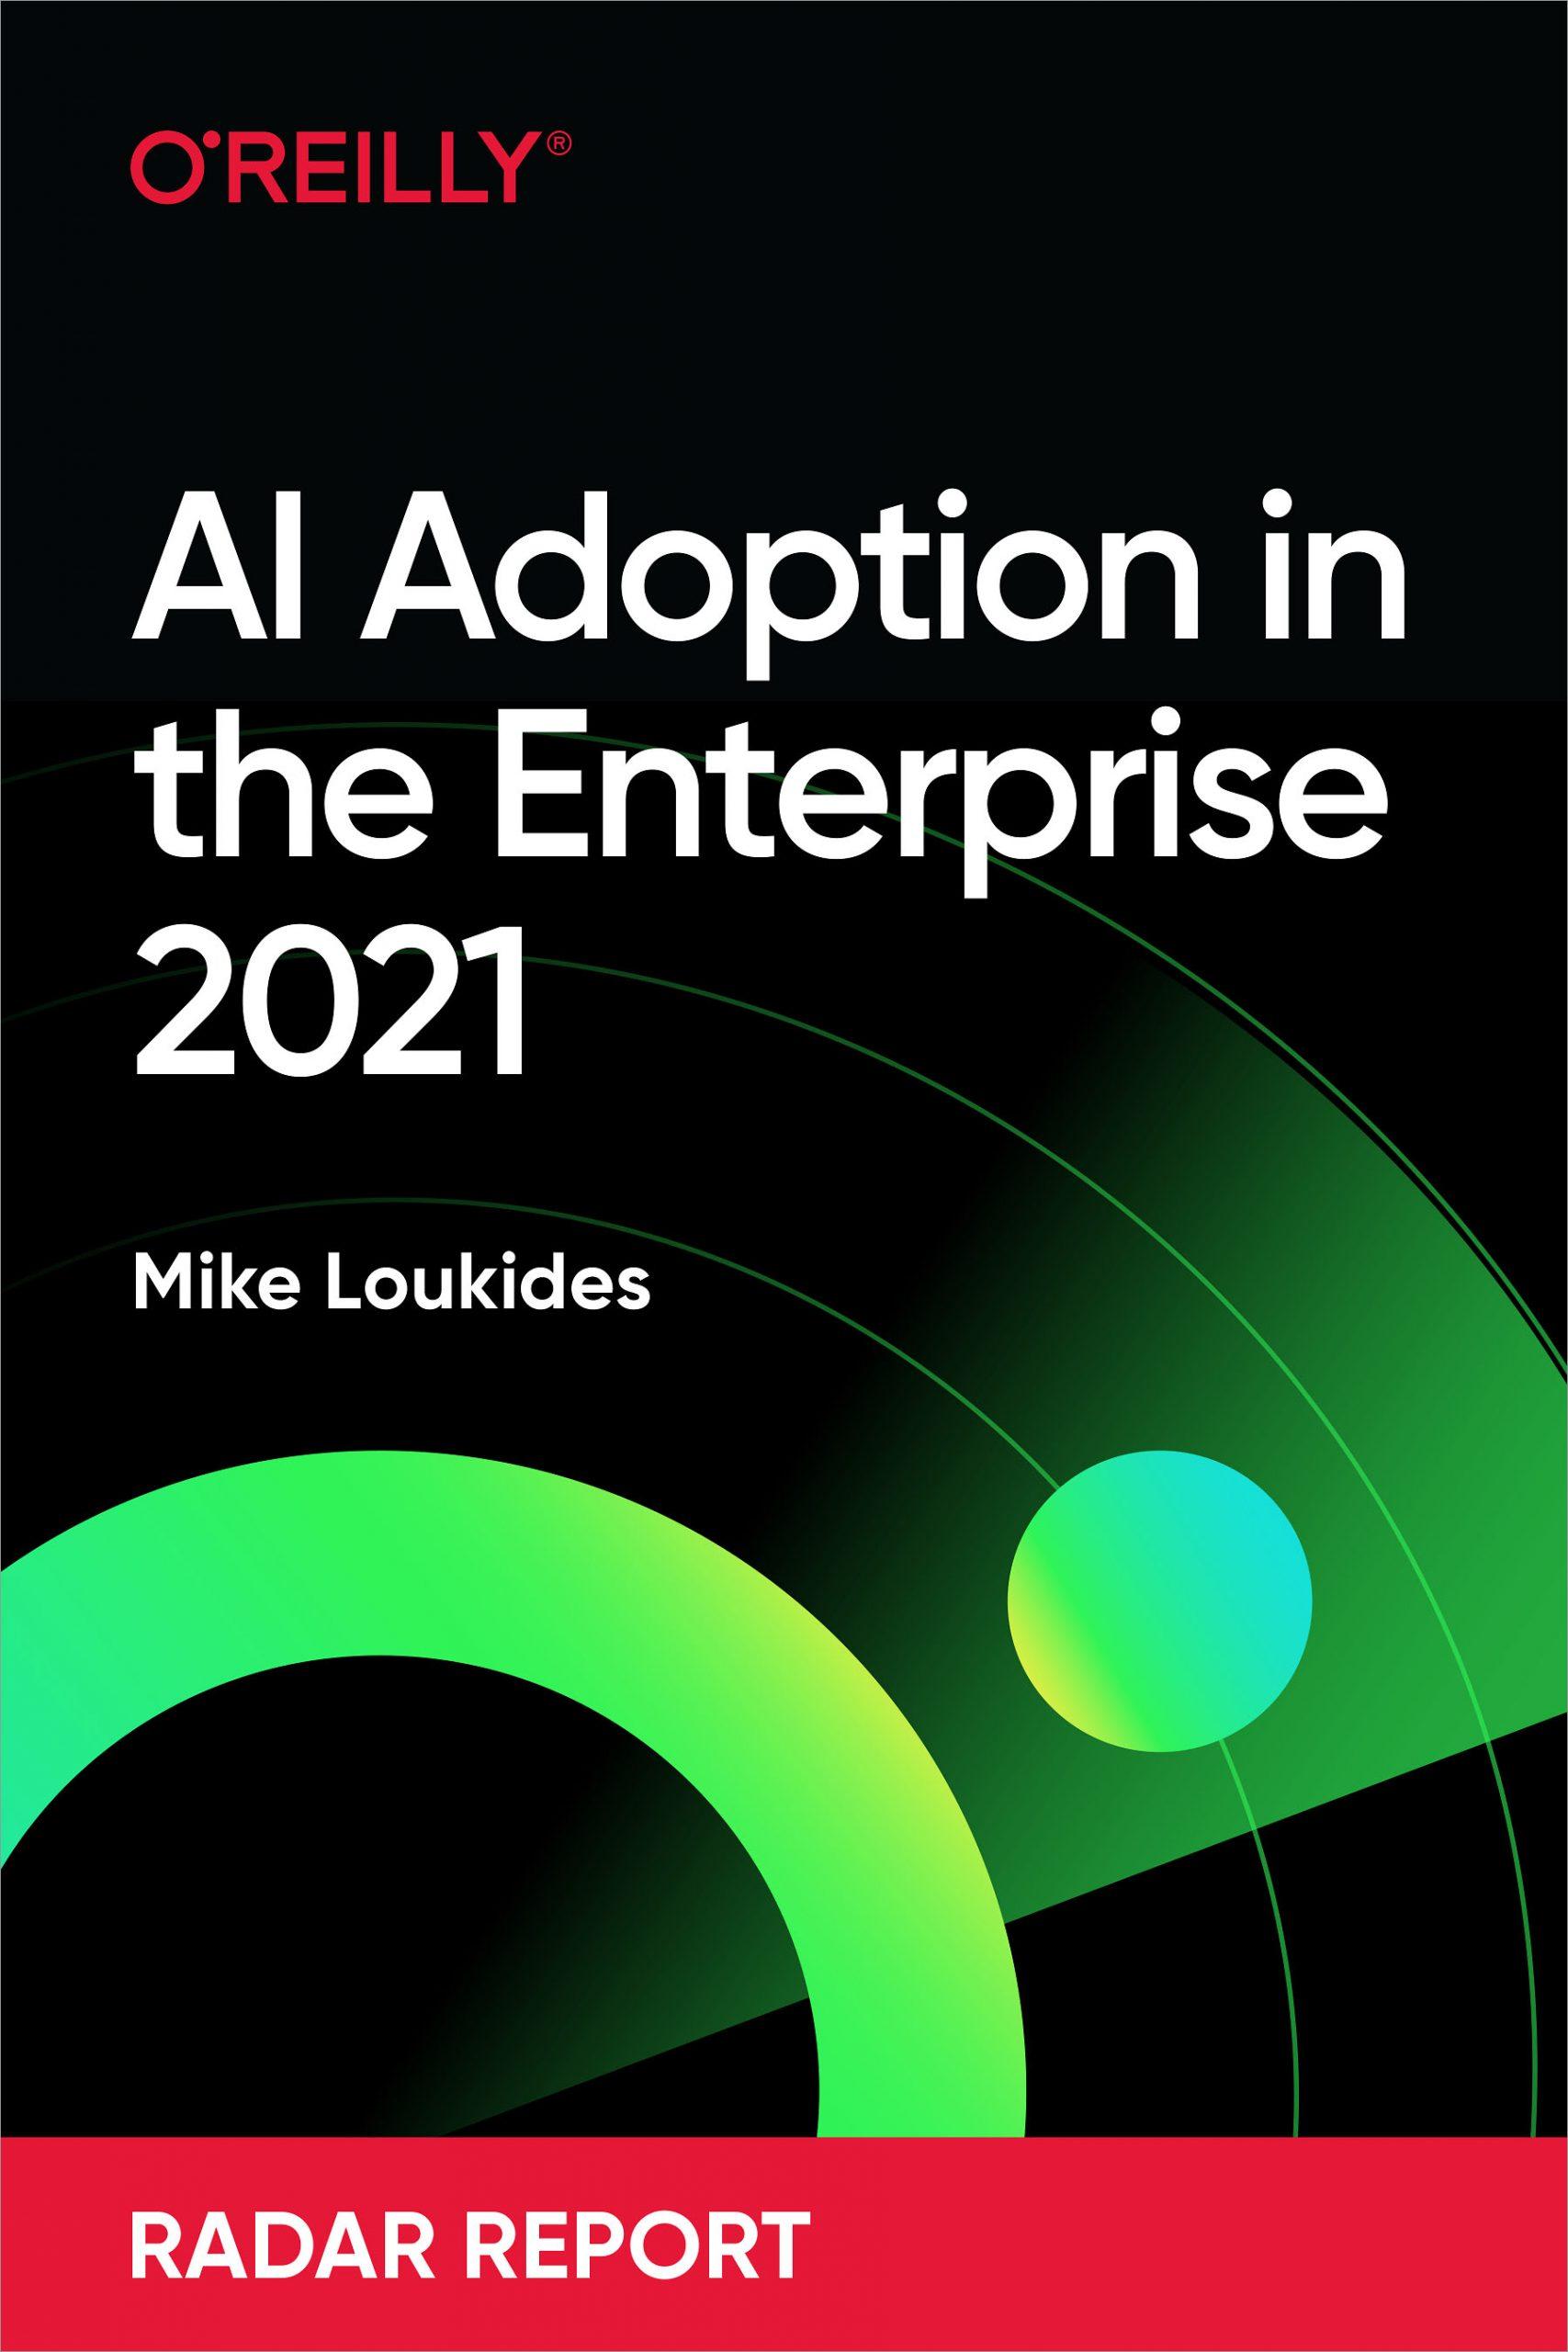 AI Adoption in the Enterprise 2021